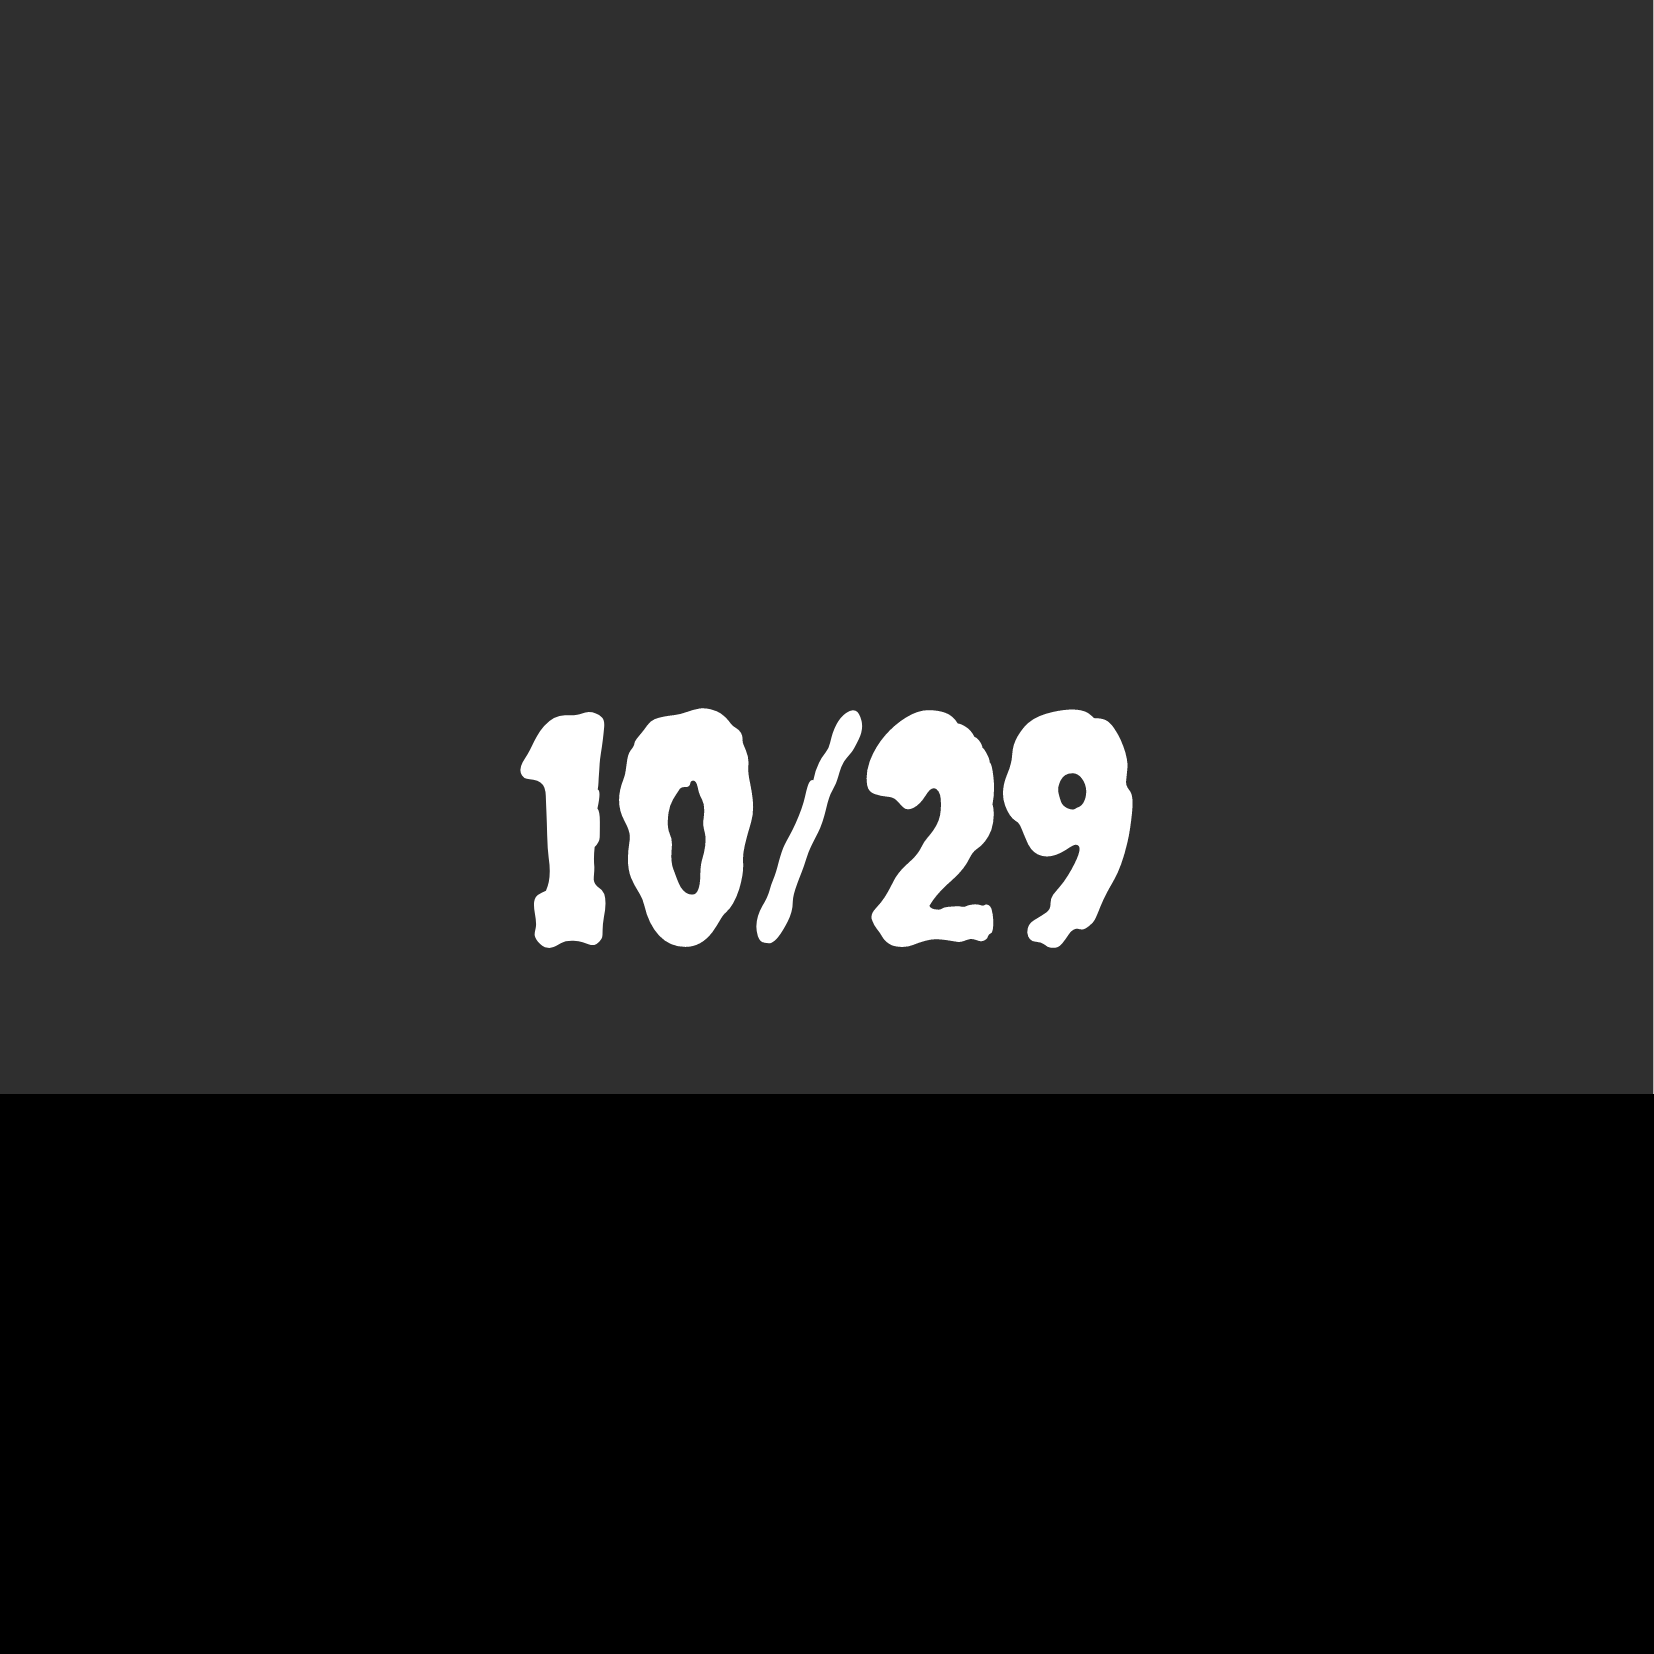 Halloween Event - 10/29